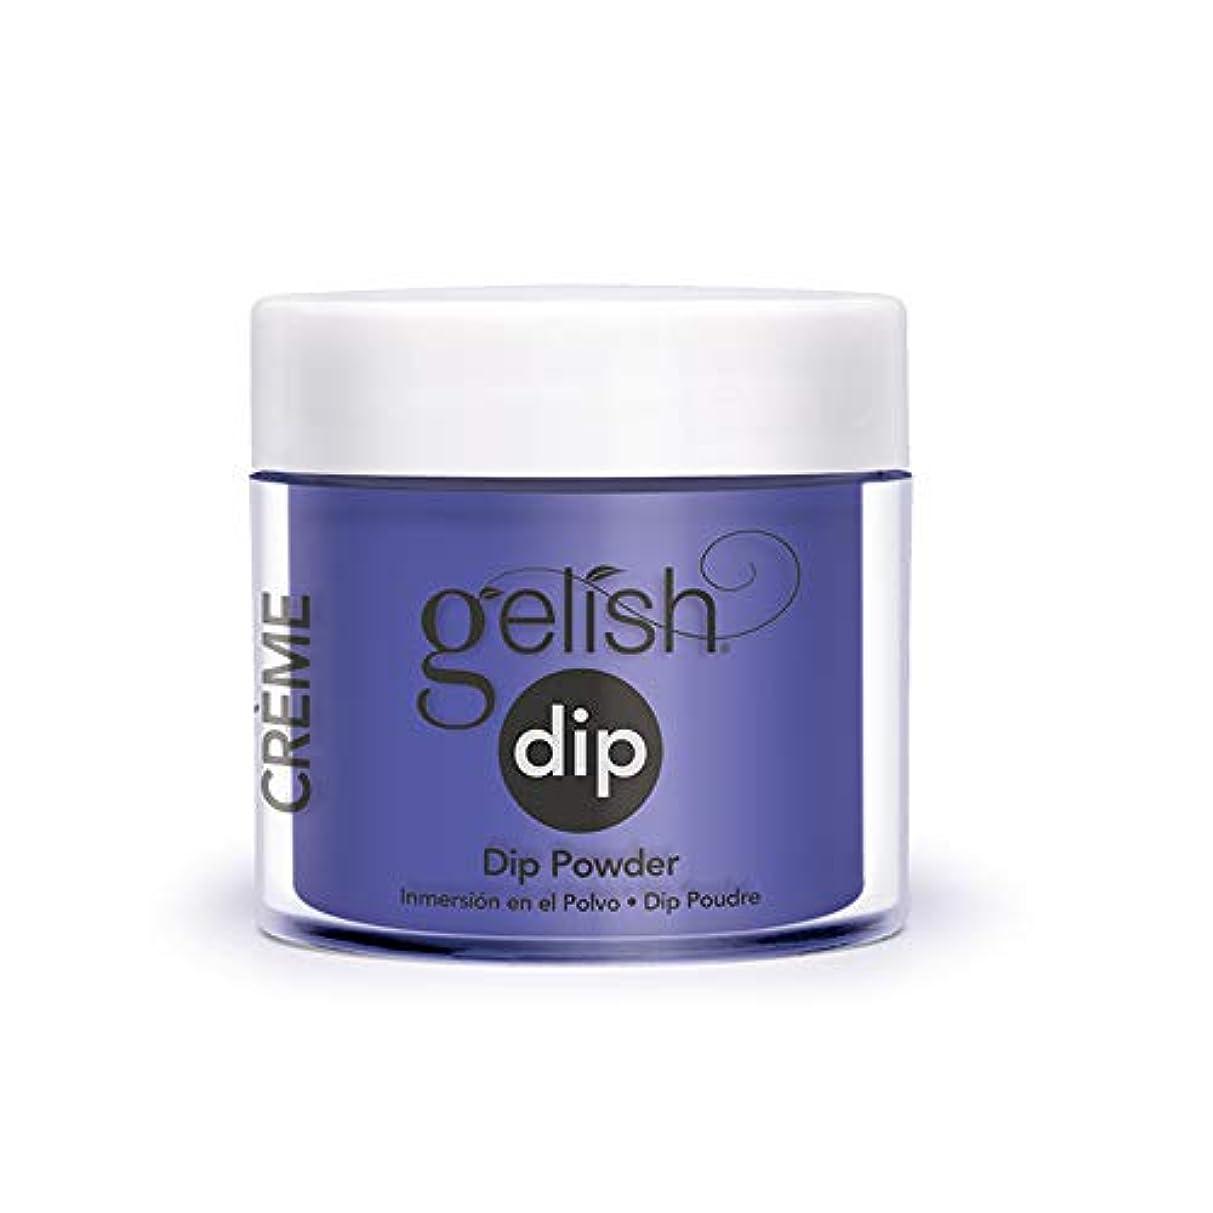 Harmony Gelish - Acrylic Dip Powder - Making Waves - 23g / 0.8oz